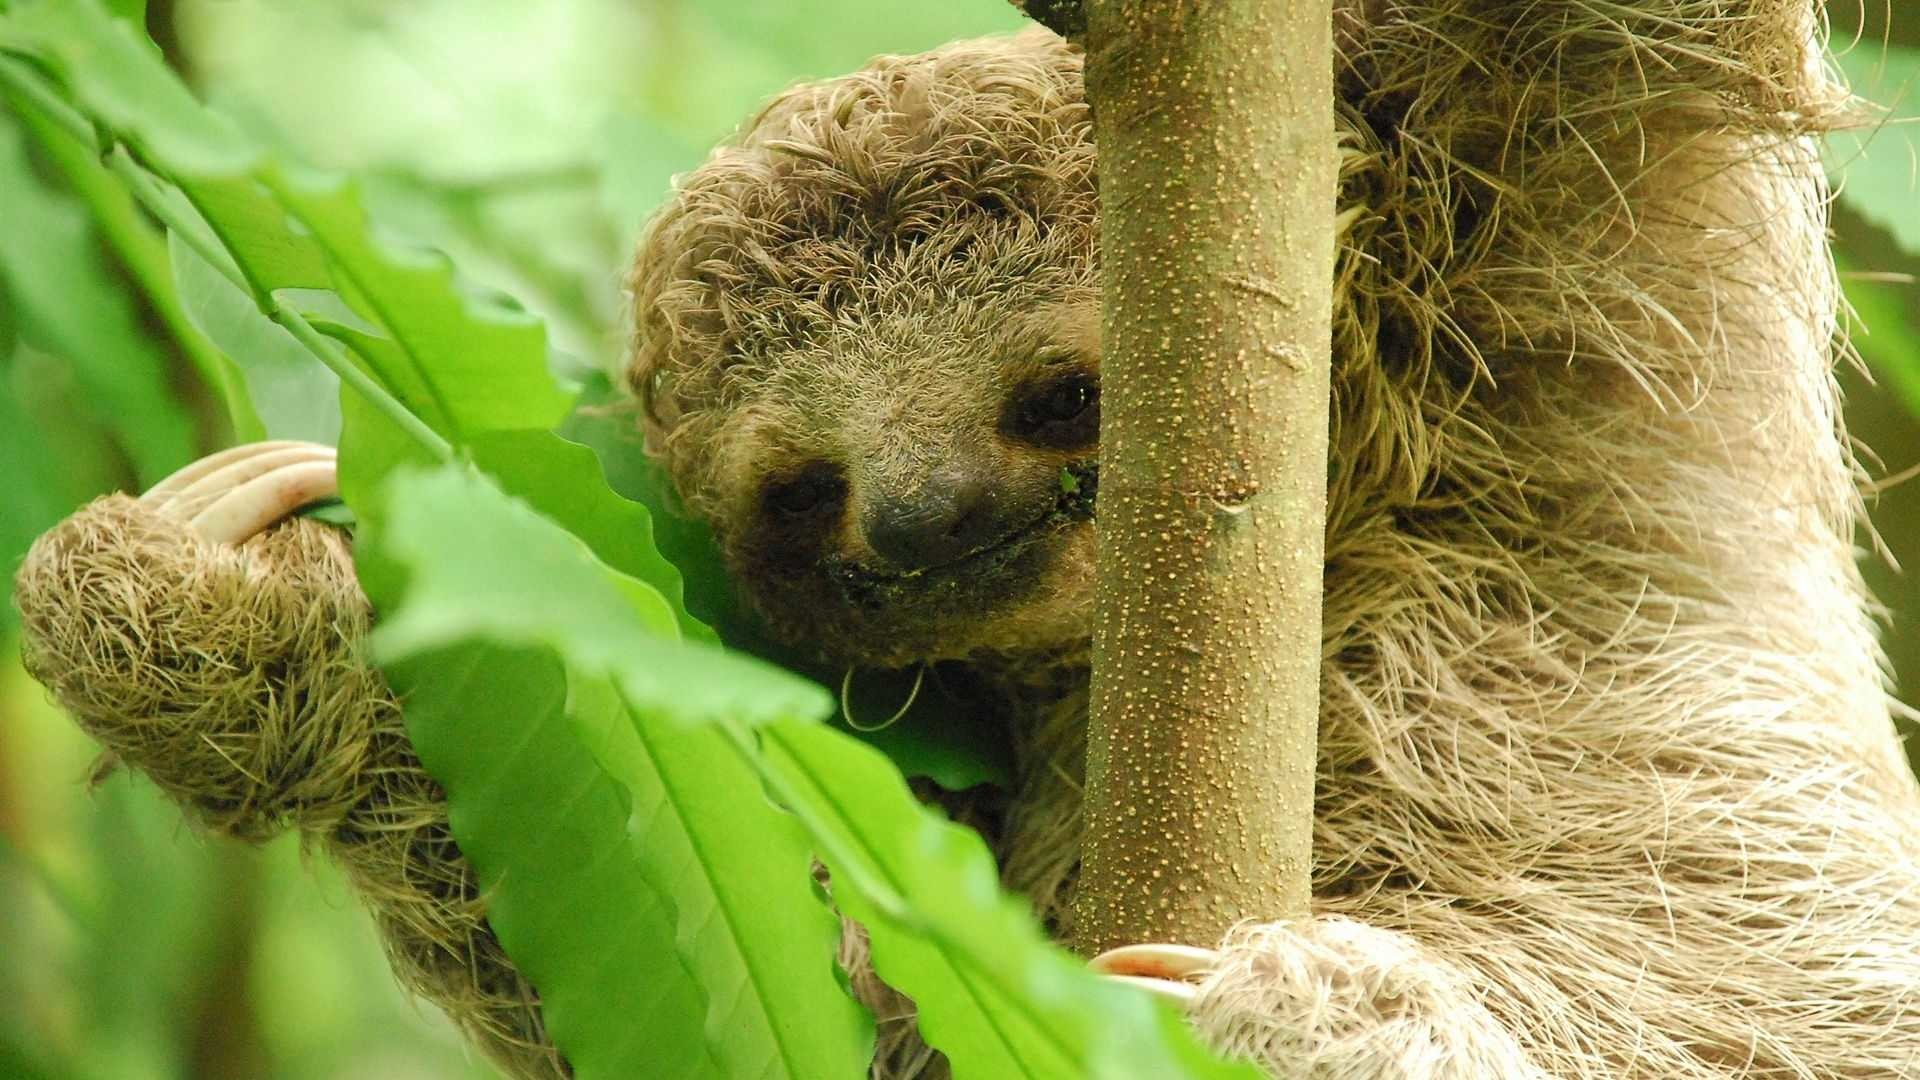 Baby Sloth Wallpaper Baby-sloth-300-dpi.jpg.1920x .